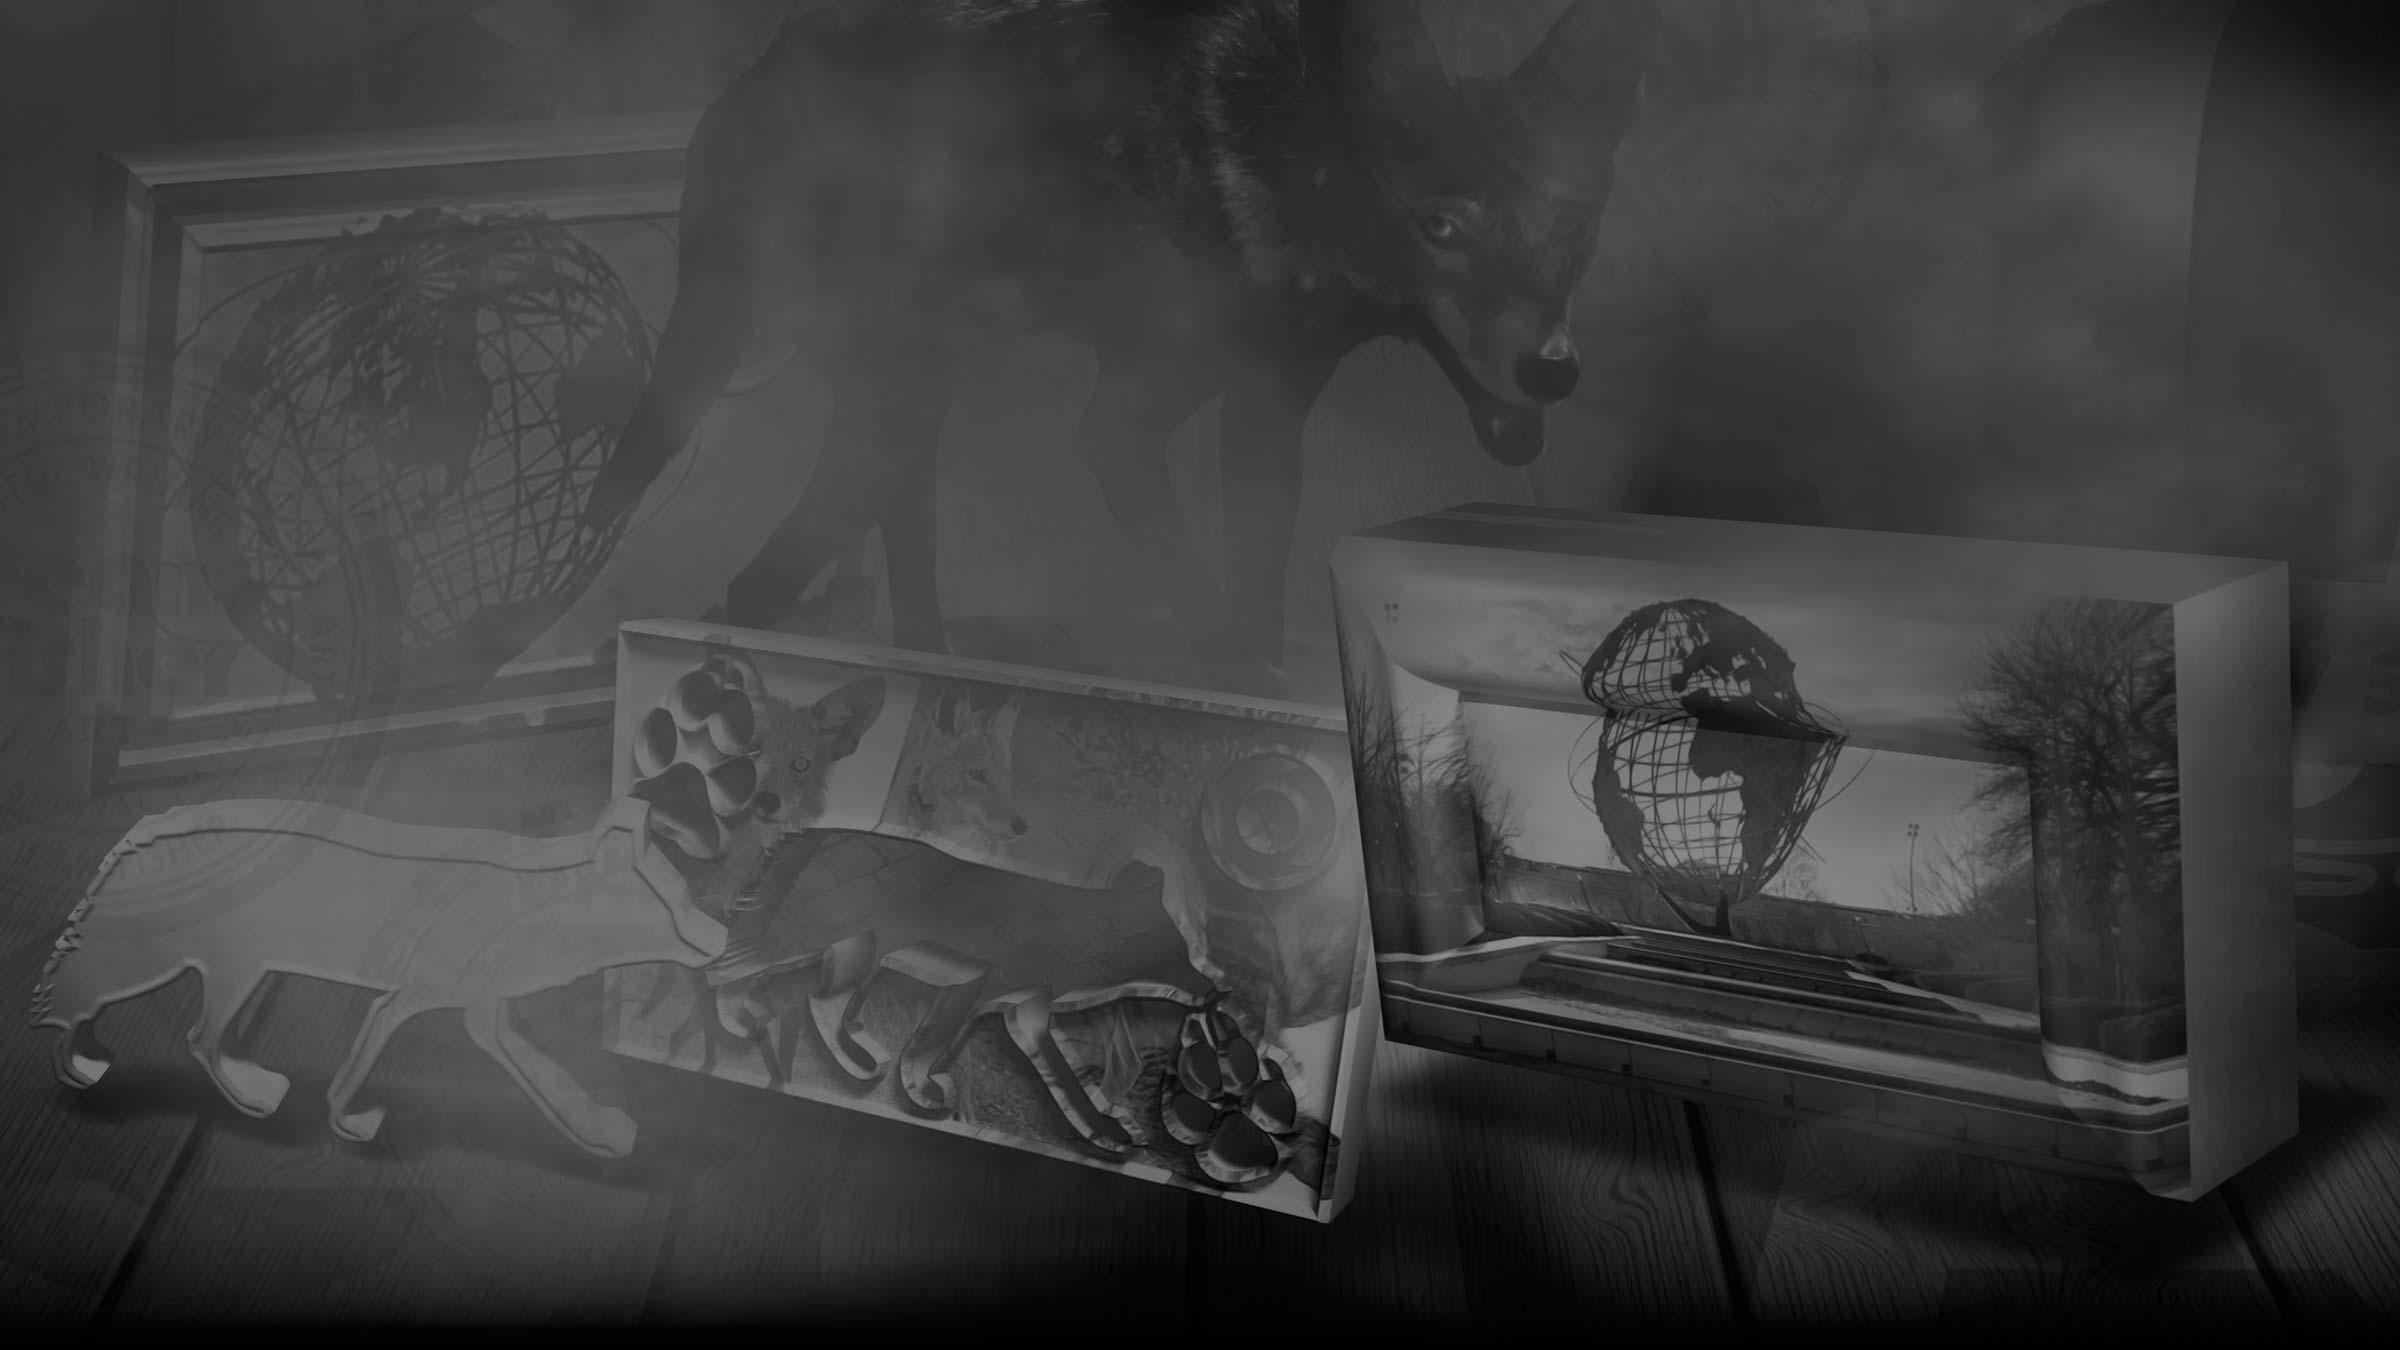 Cinematic scene using coyote iconography